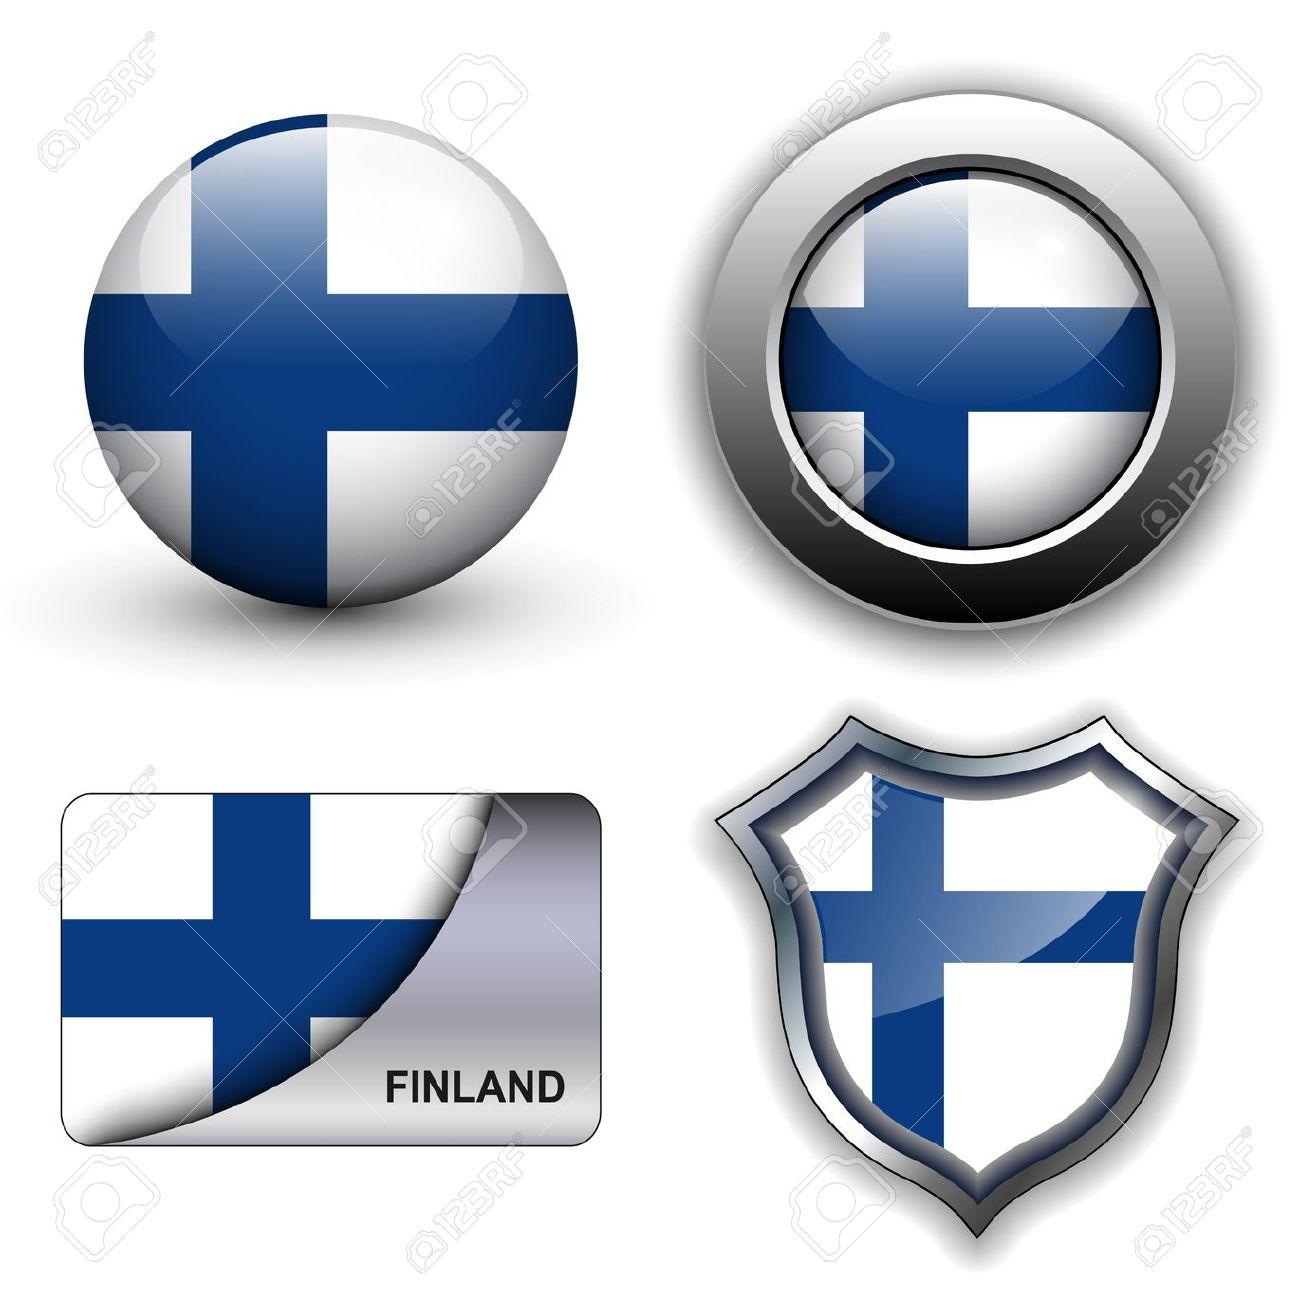 Free clipart finnish flag.